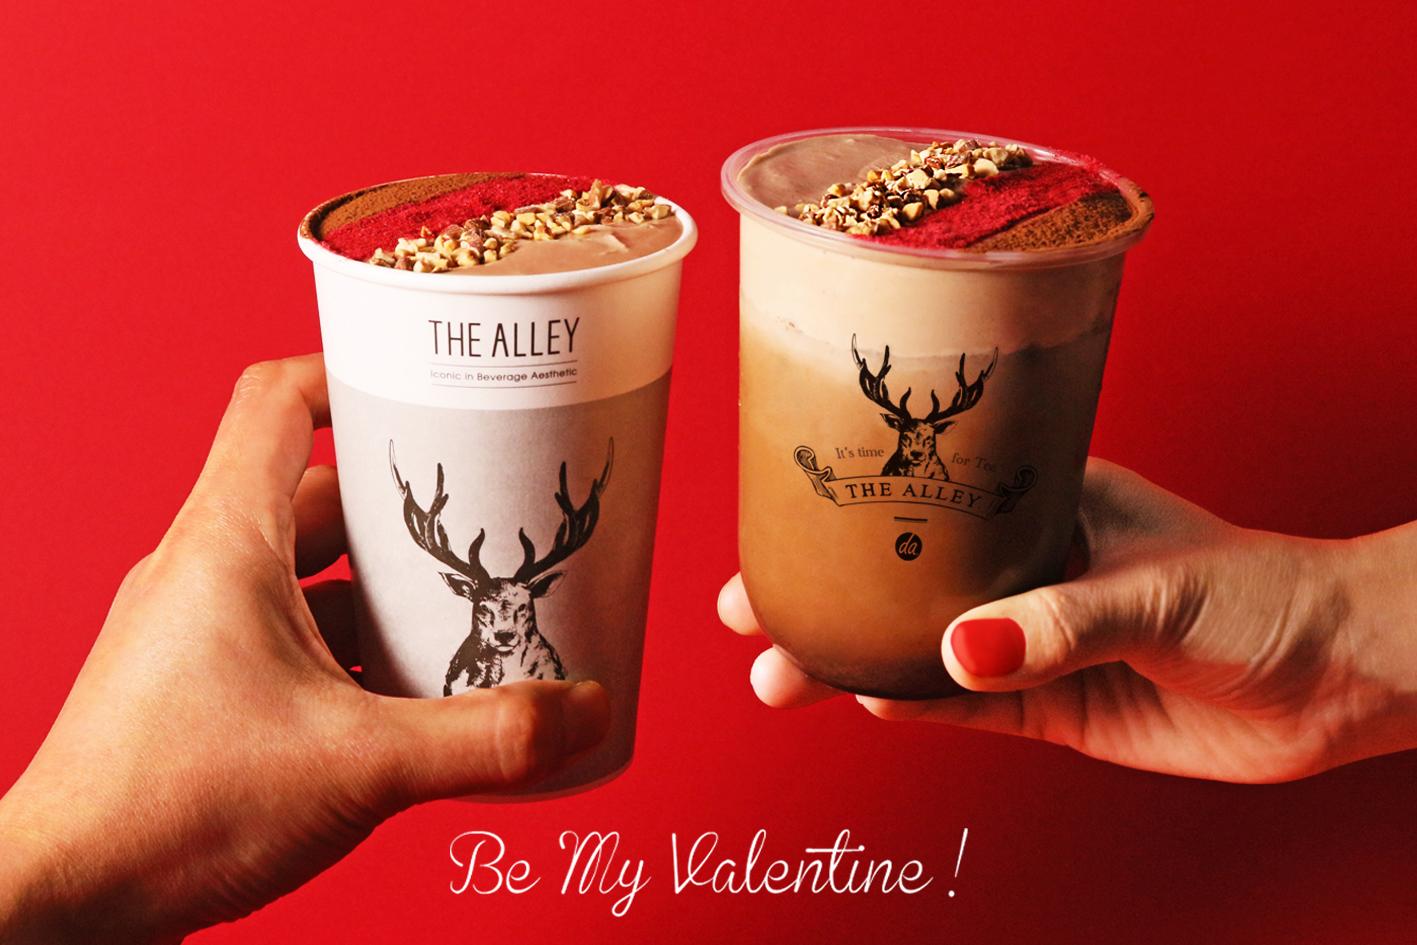 【THE ALLEY】バレンタイン限定ドリンク『ショコラキャラメルミルクティー』が1月14日(木)販売開始❤️